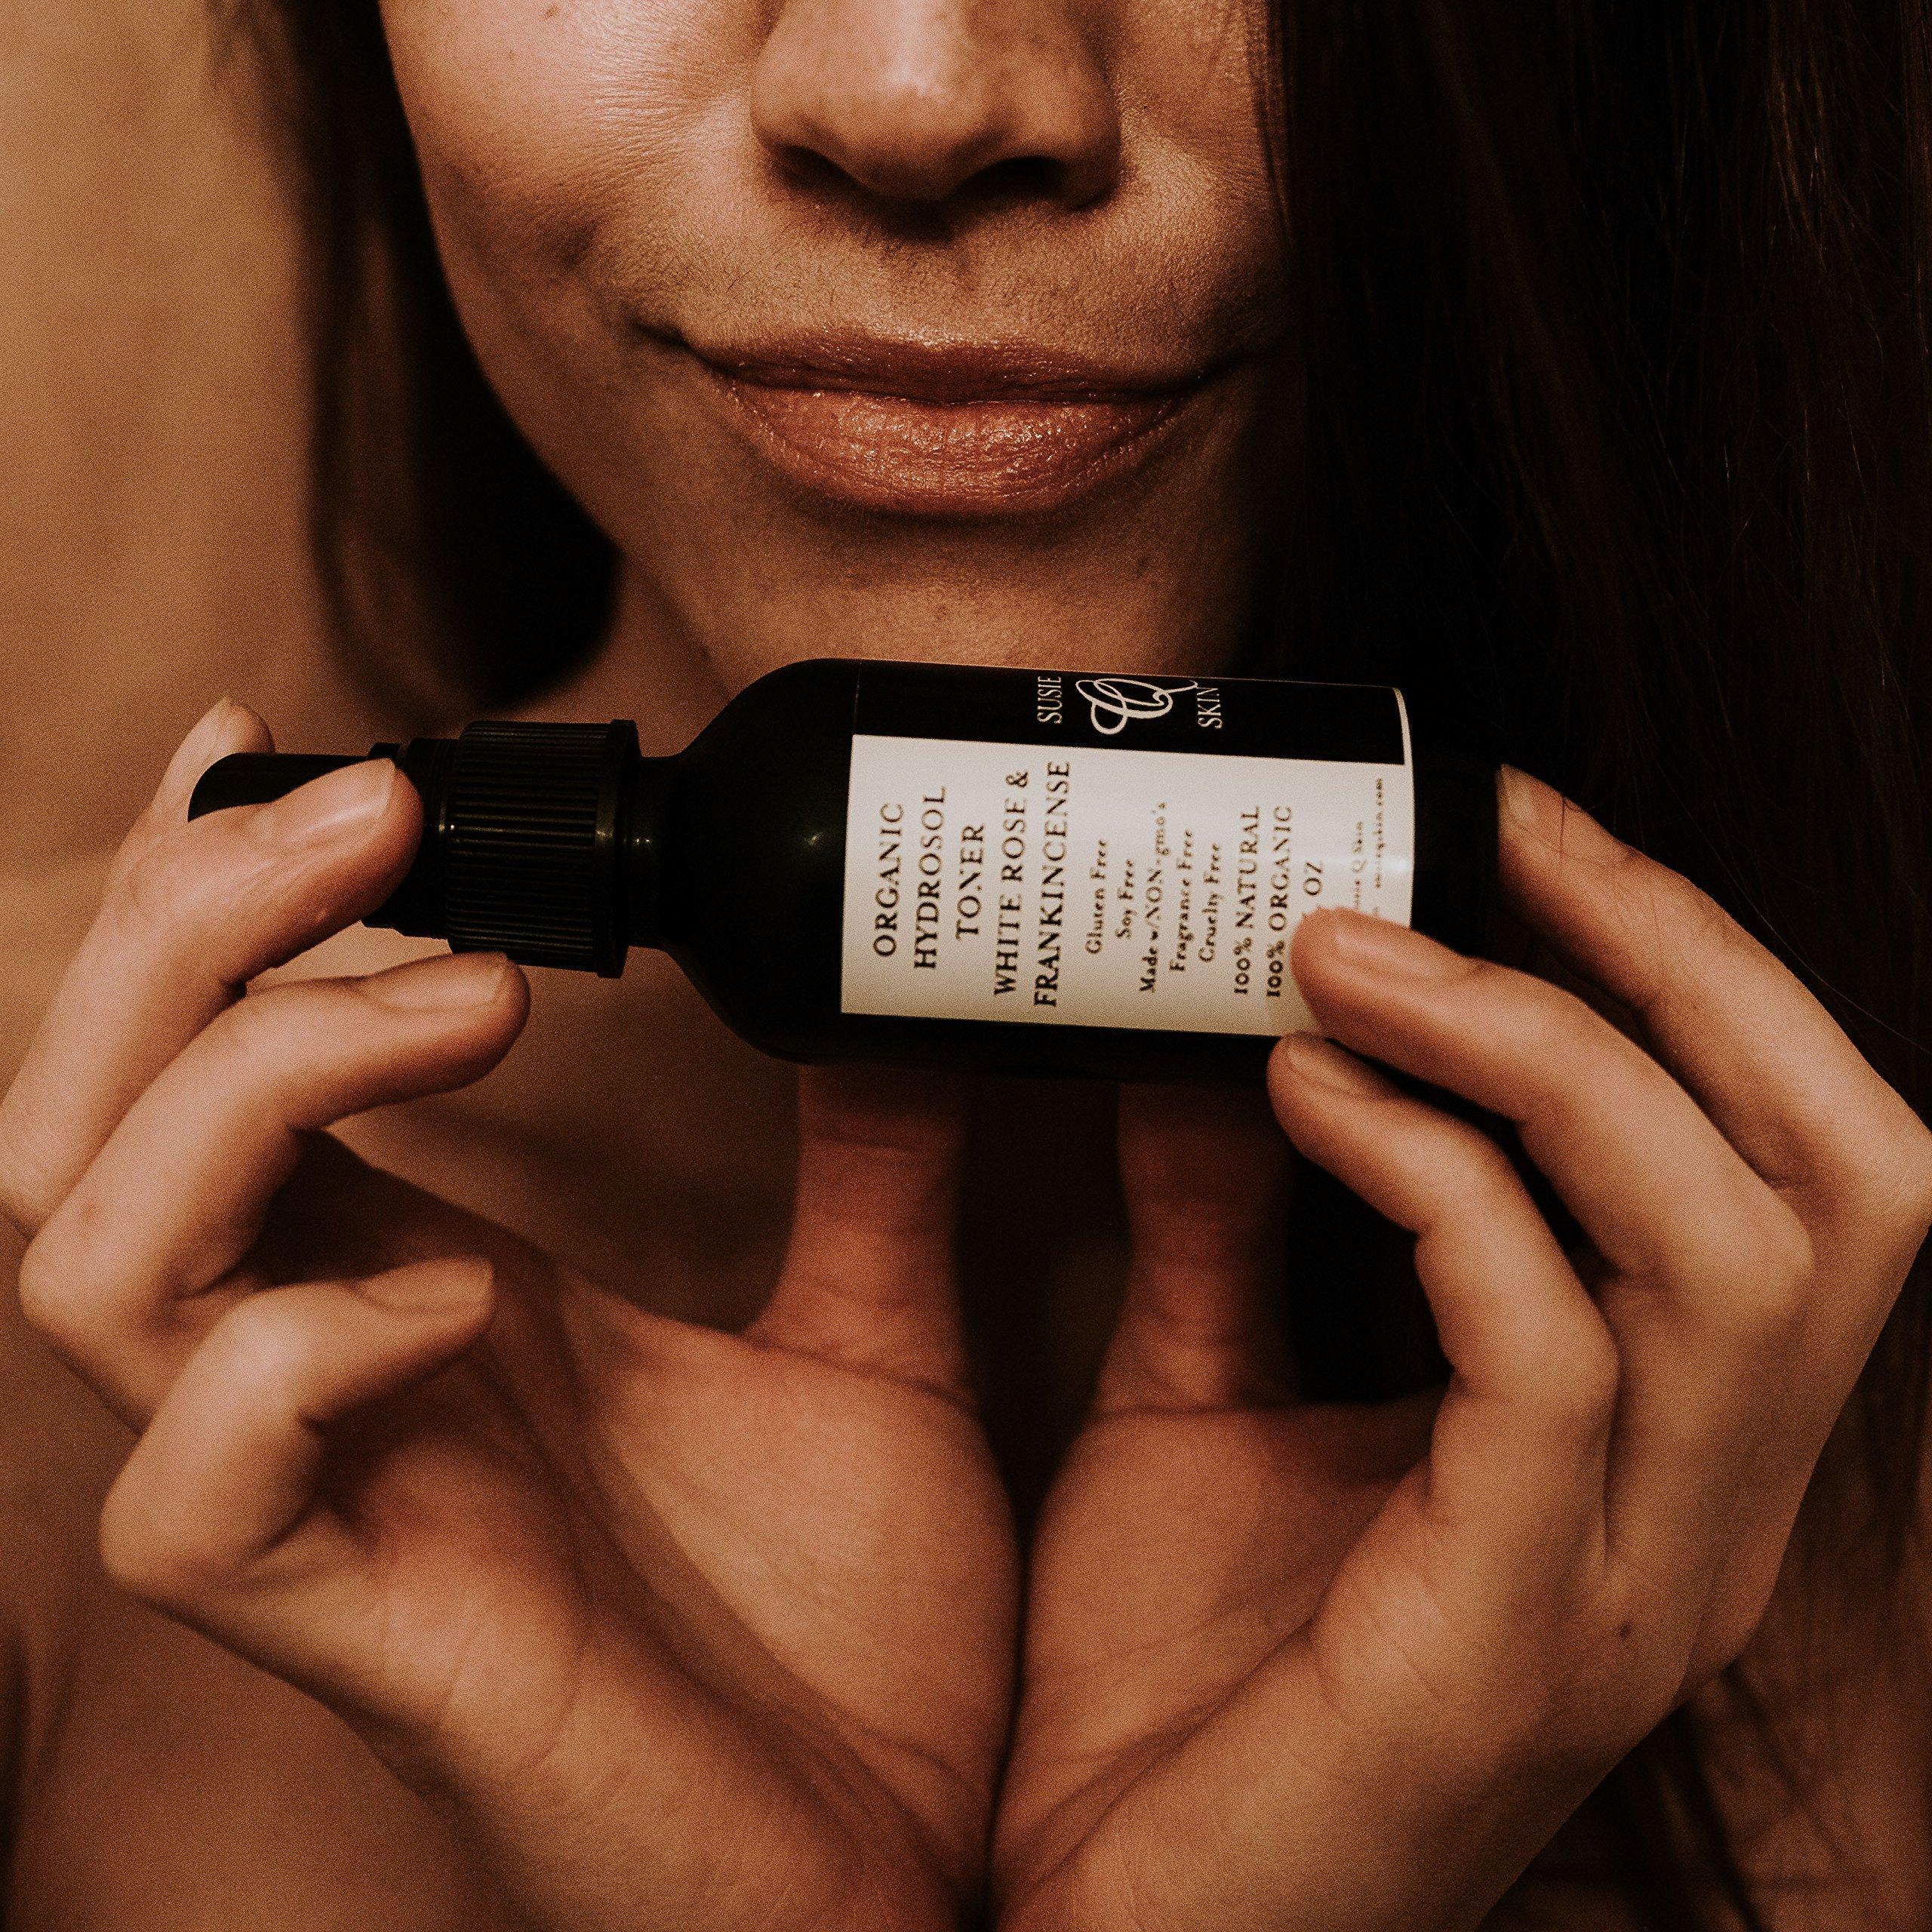 White Rose Frankincense Organic Hydrosol Toner, 2oz, Rose Distillate, Healing Frankincense, Tighten and Tone Pores, Balance pH, Replenish Moisture